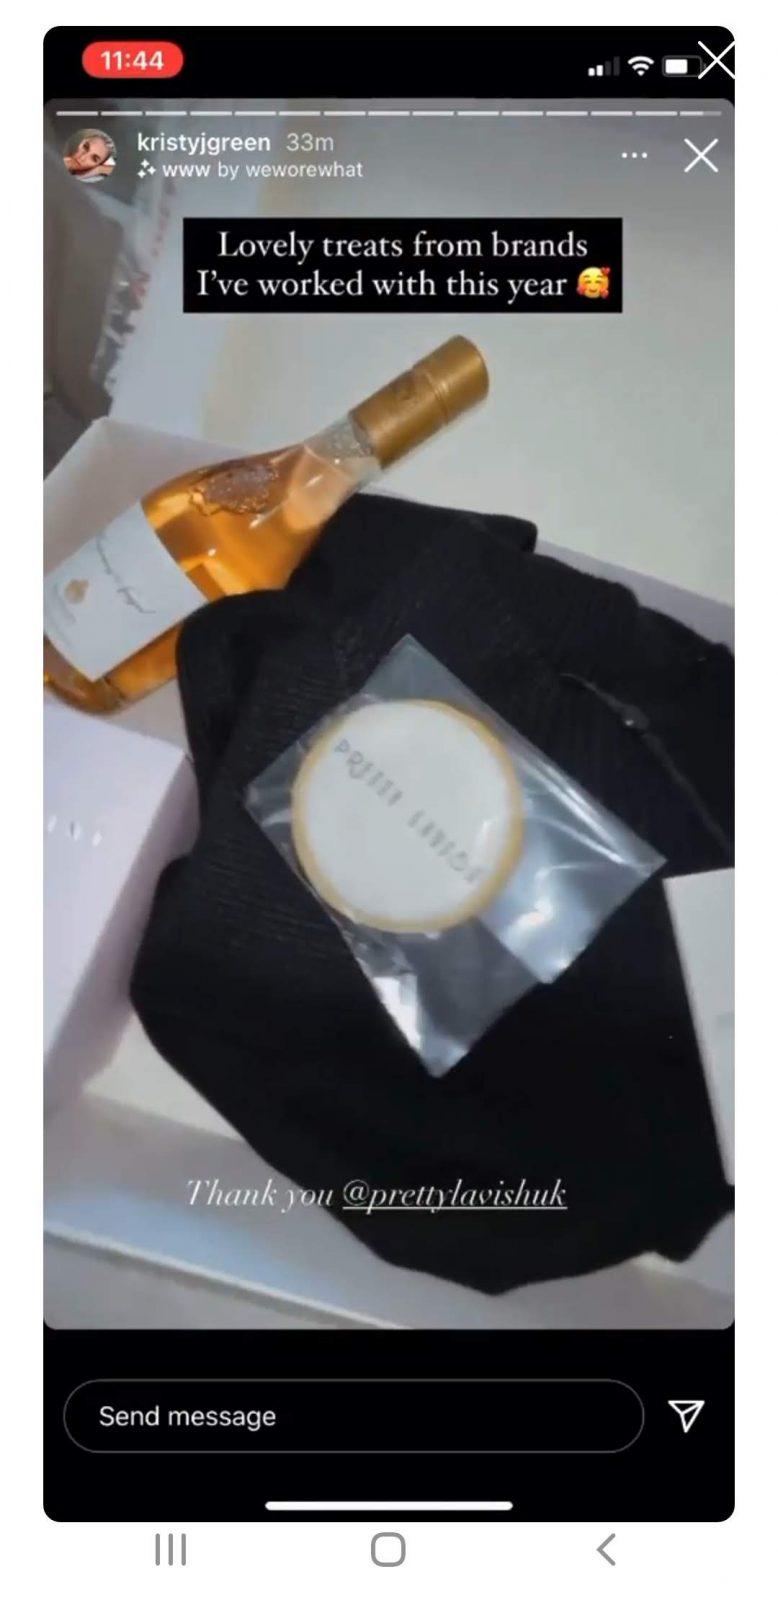 Influencer biscuit gift mailer